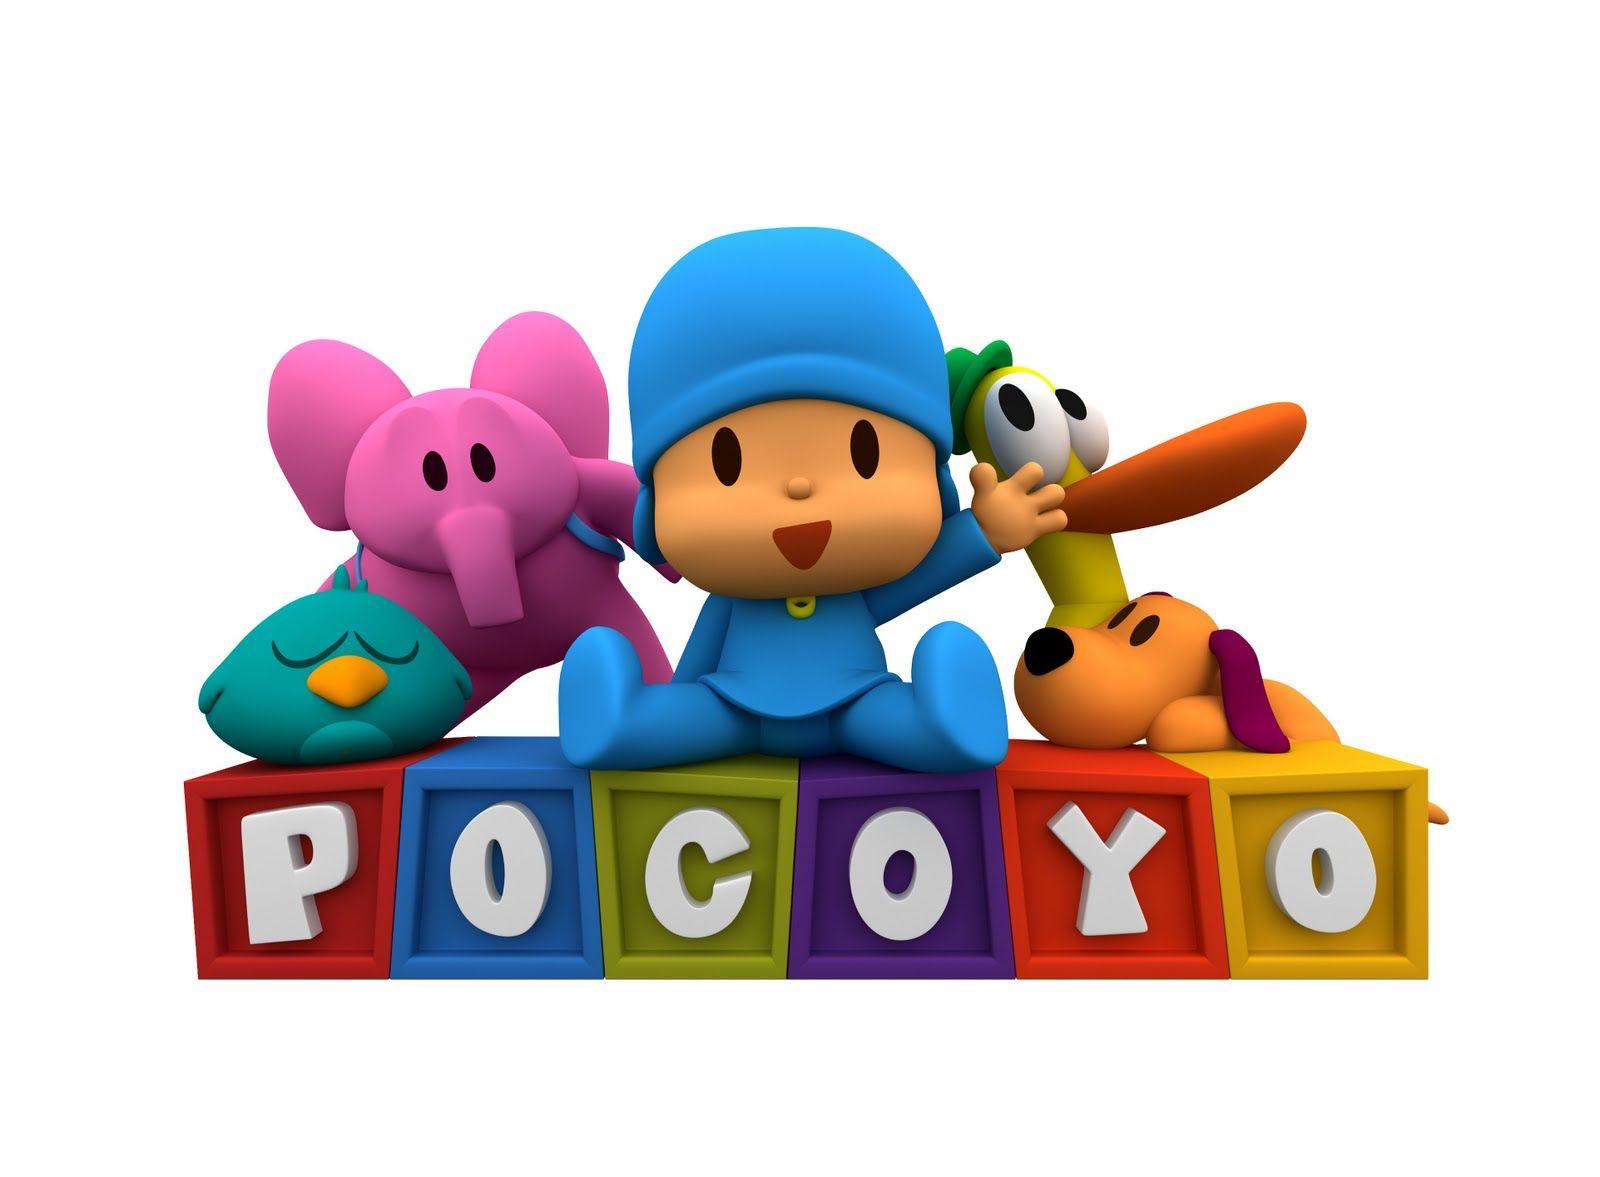 Pocoyo Imagens Coisas Para Usar Pinterest Pocoyo Birthdays And Birthday Party Ideas